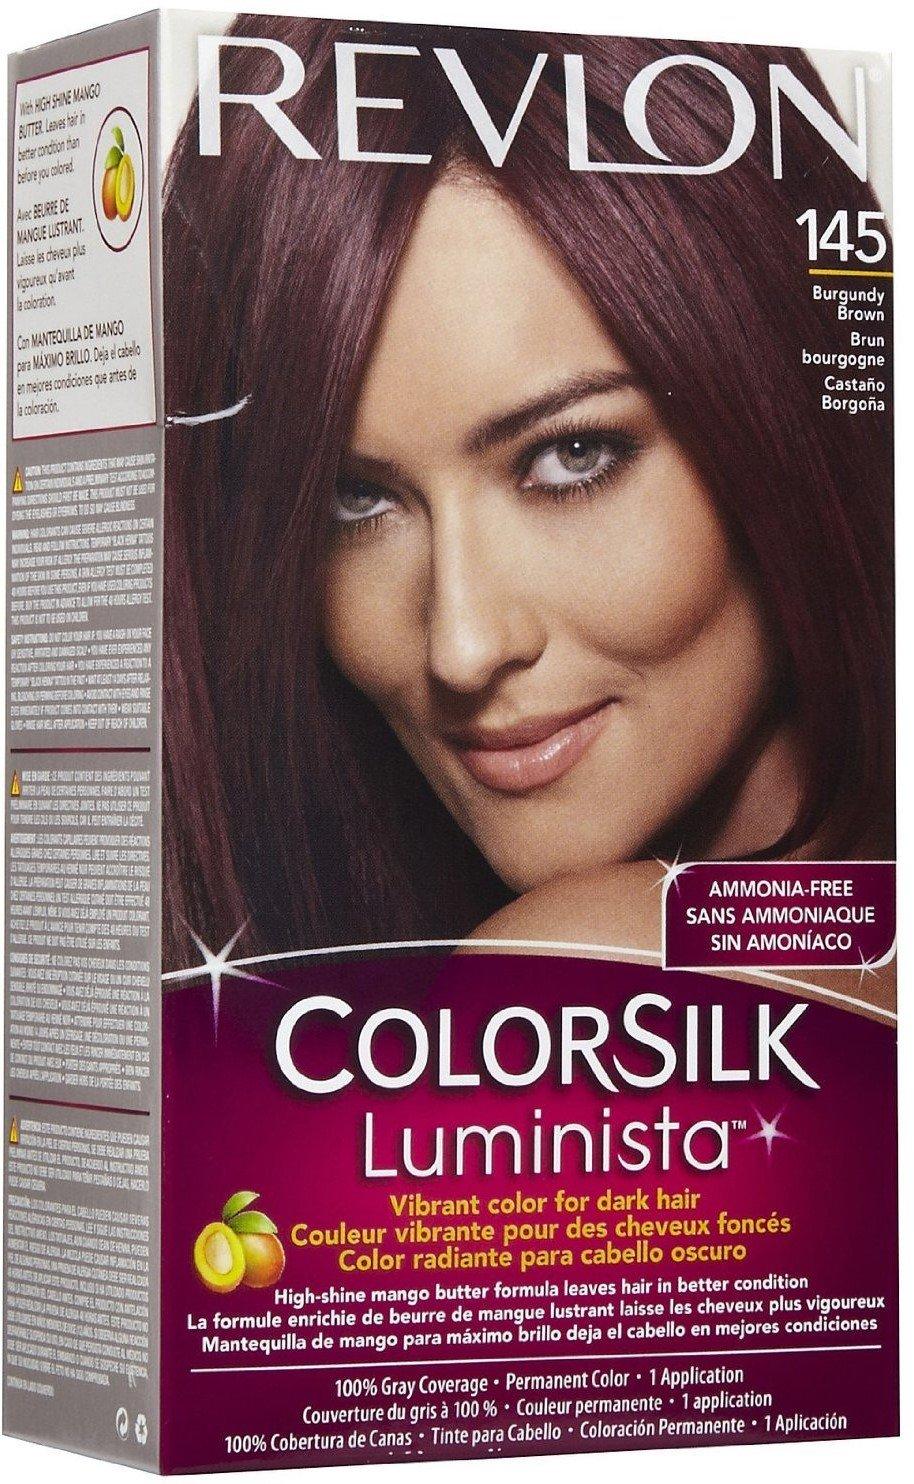 Best Revlon Colorsilk Luminista Hair Color 145 Burgundy Brown 1 Ea